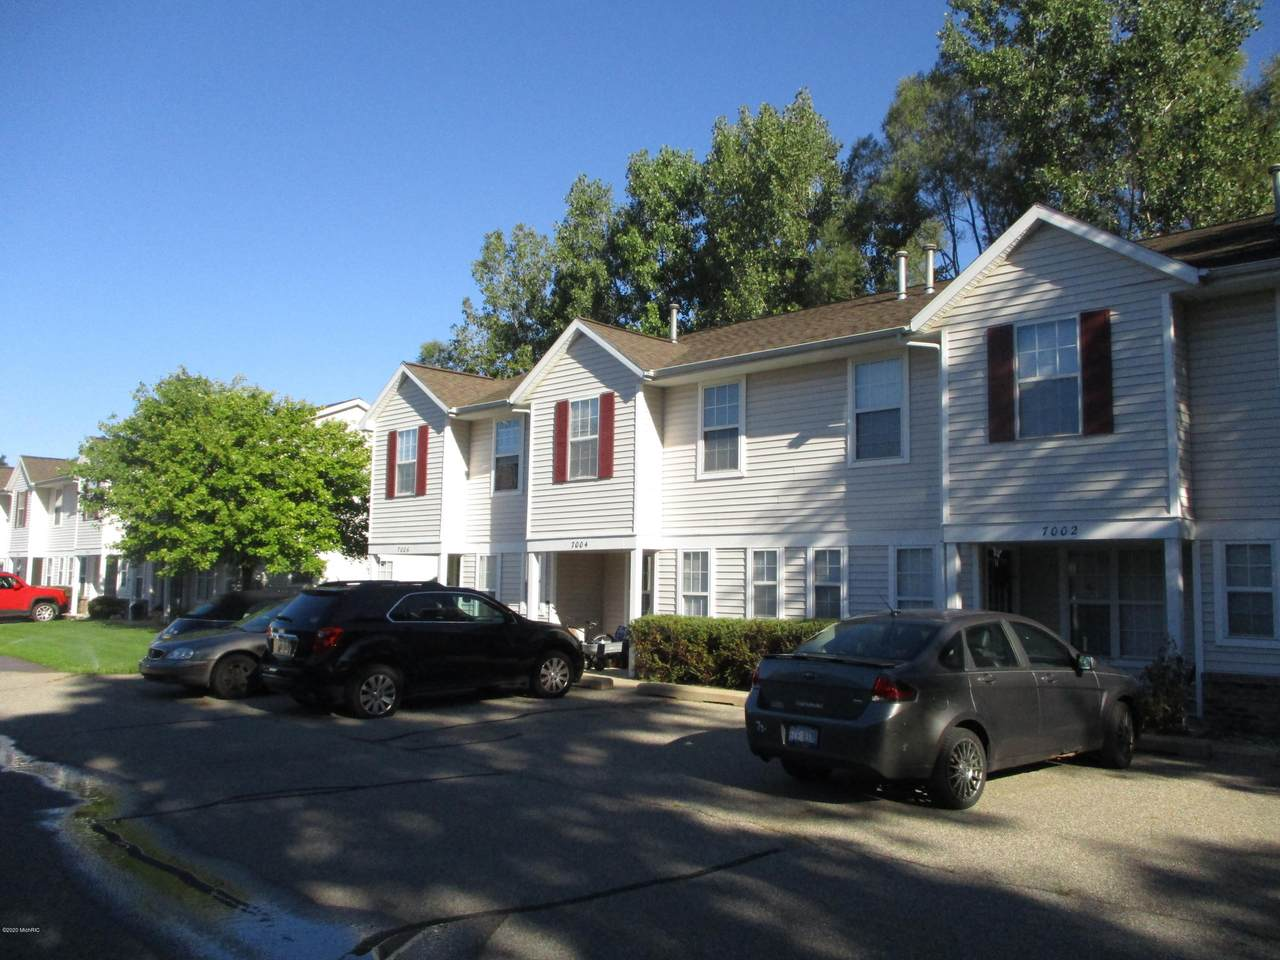 7004 Cannon Place Drive - Photo 1